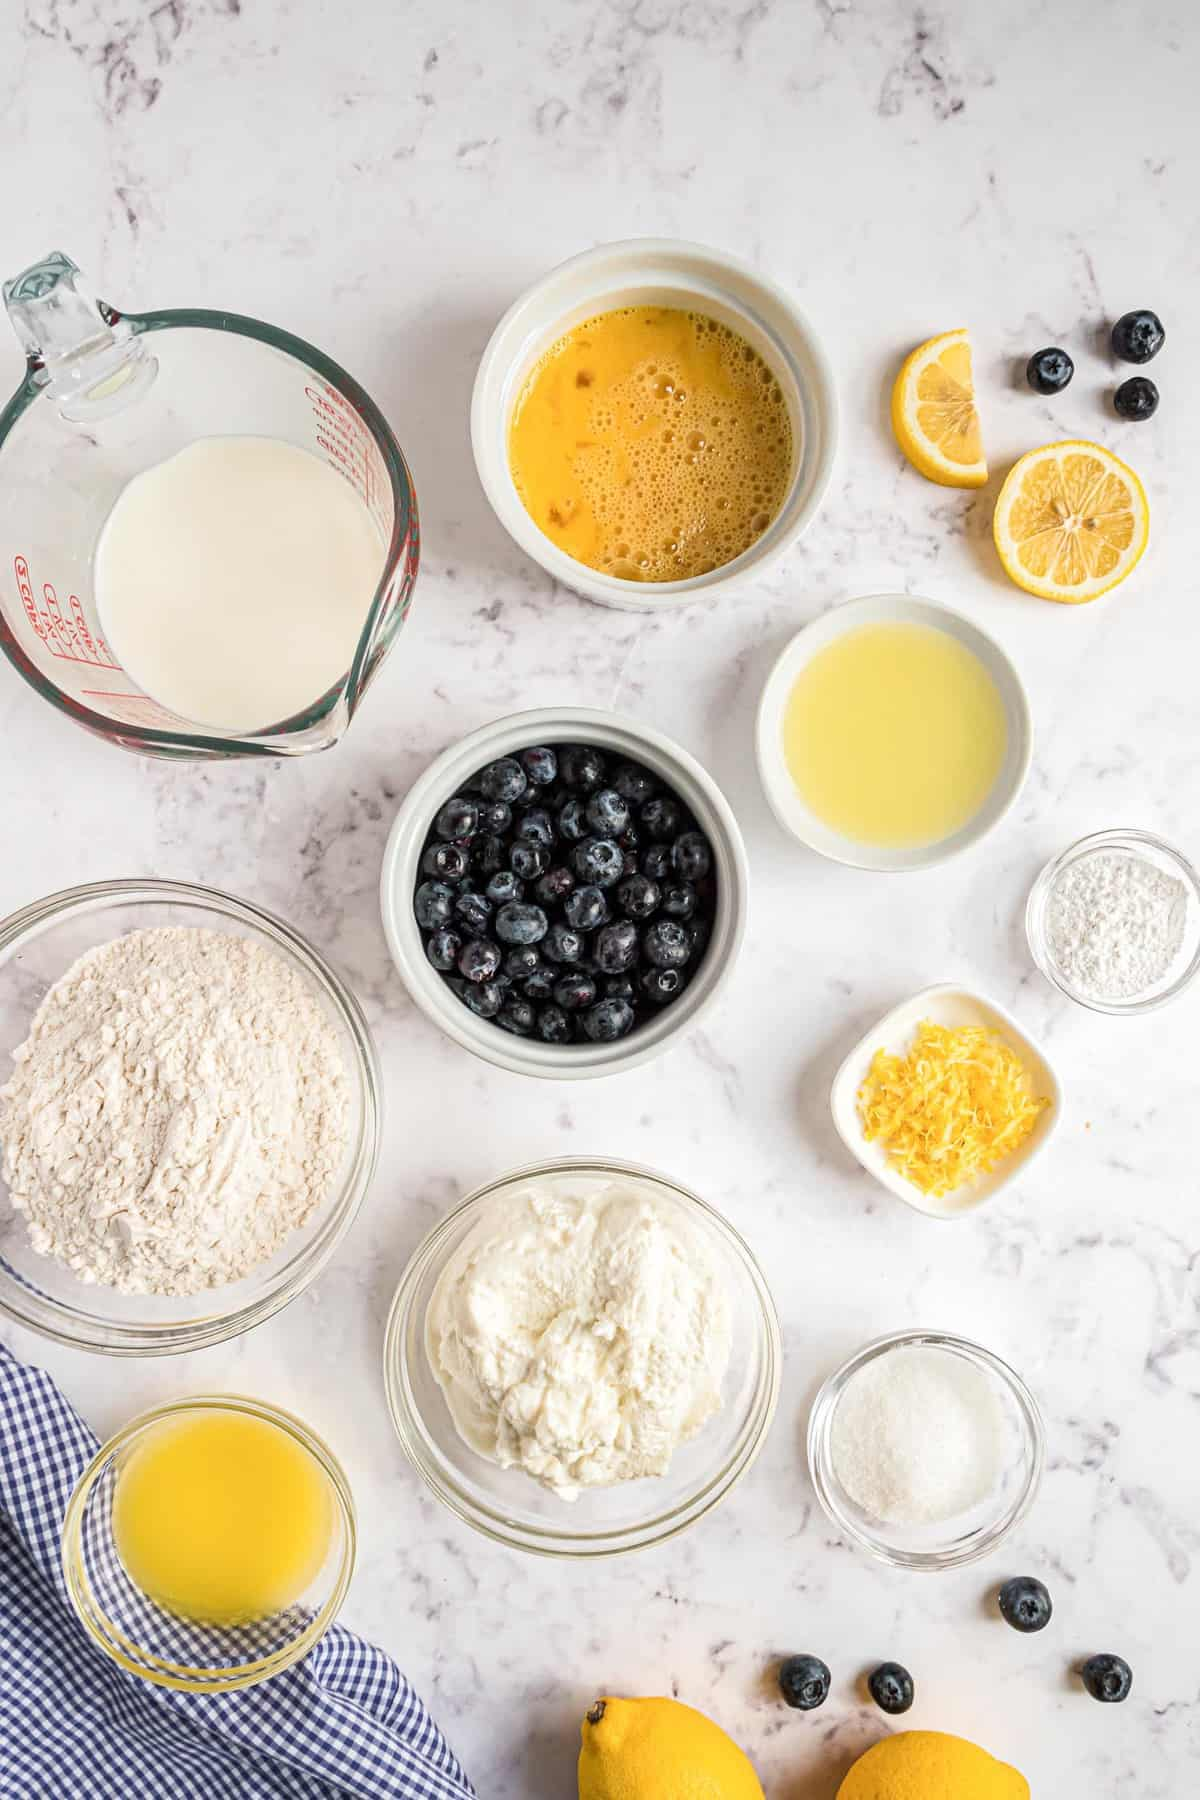 Overhead view of ingredients to make lemon blueberry ricotta pancakes.